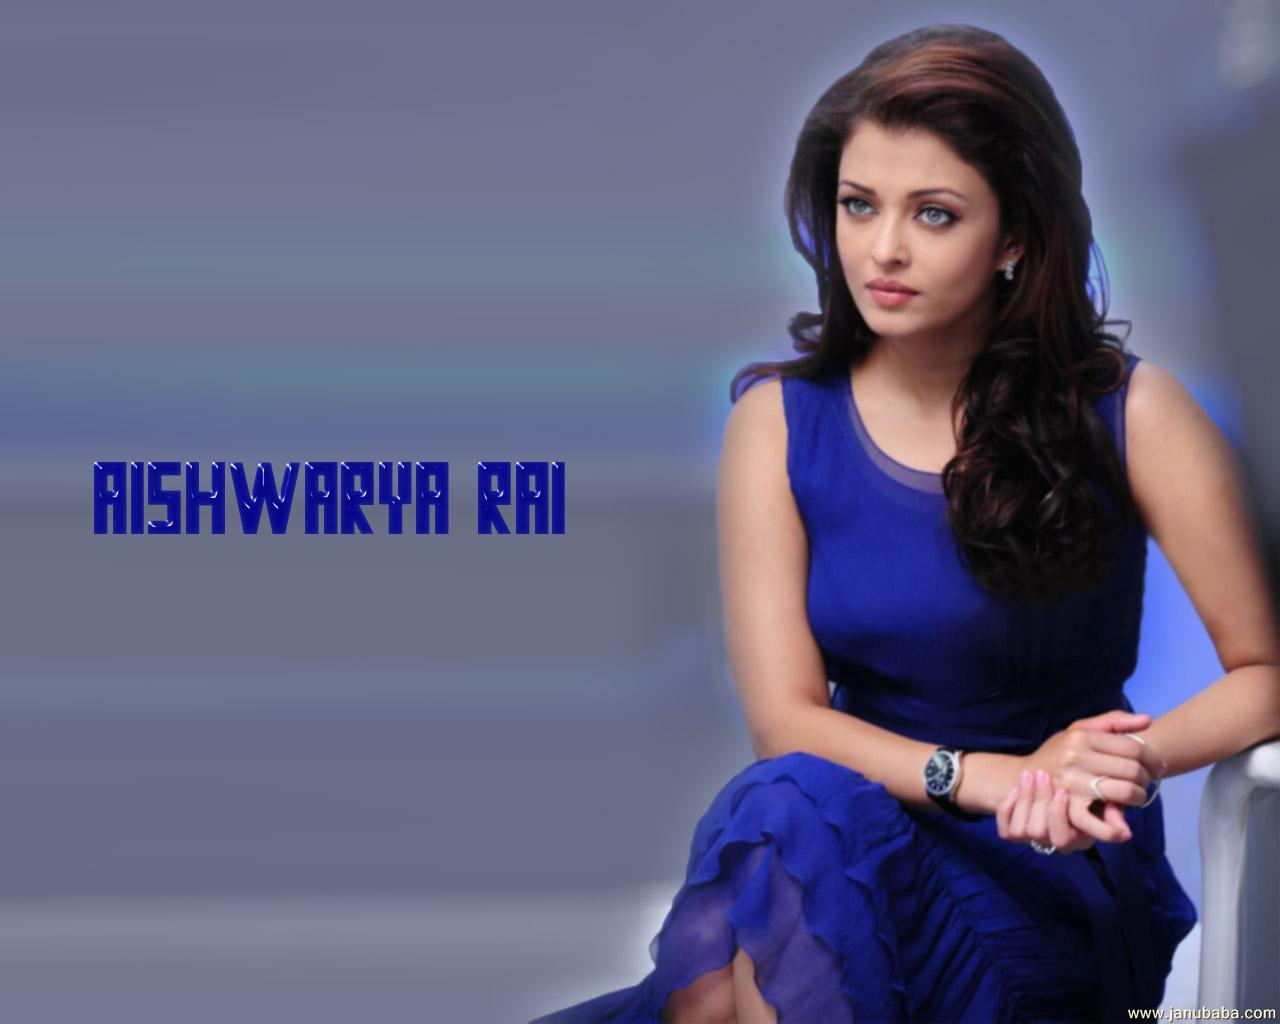 Download Sexy & Cute Girls Wallpapers: AISHWRYA RAI NEW ...